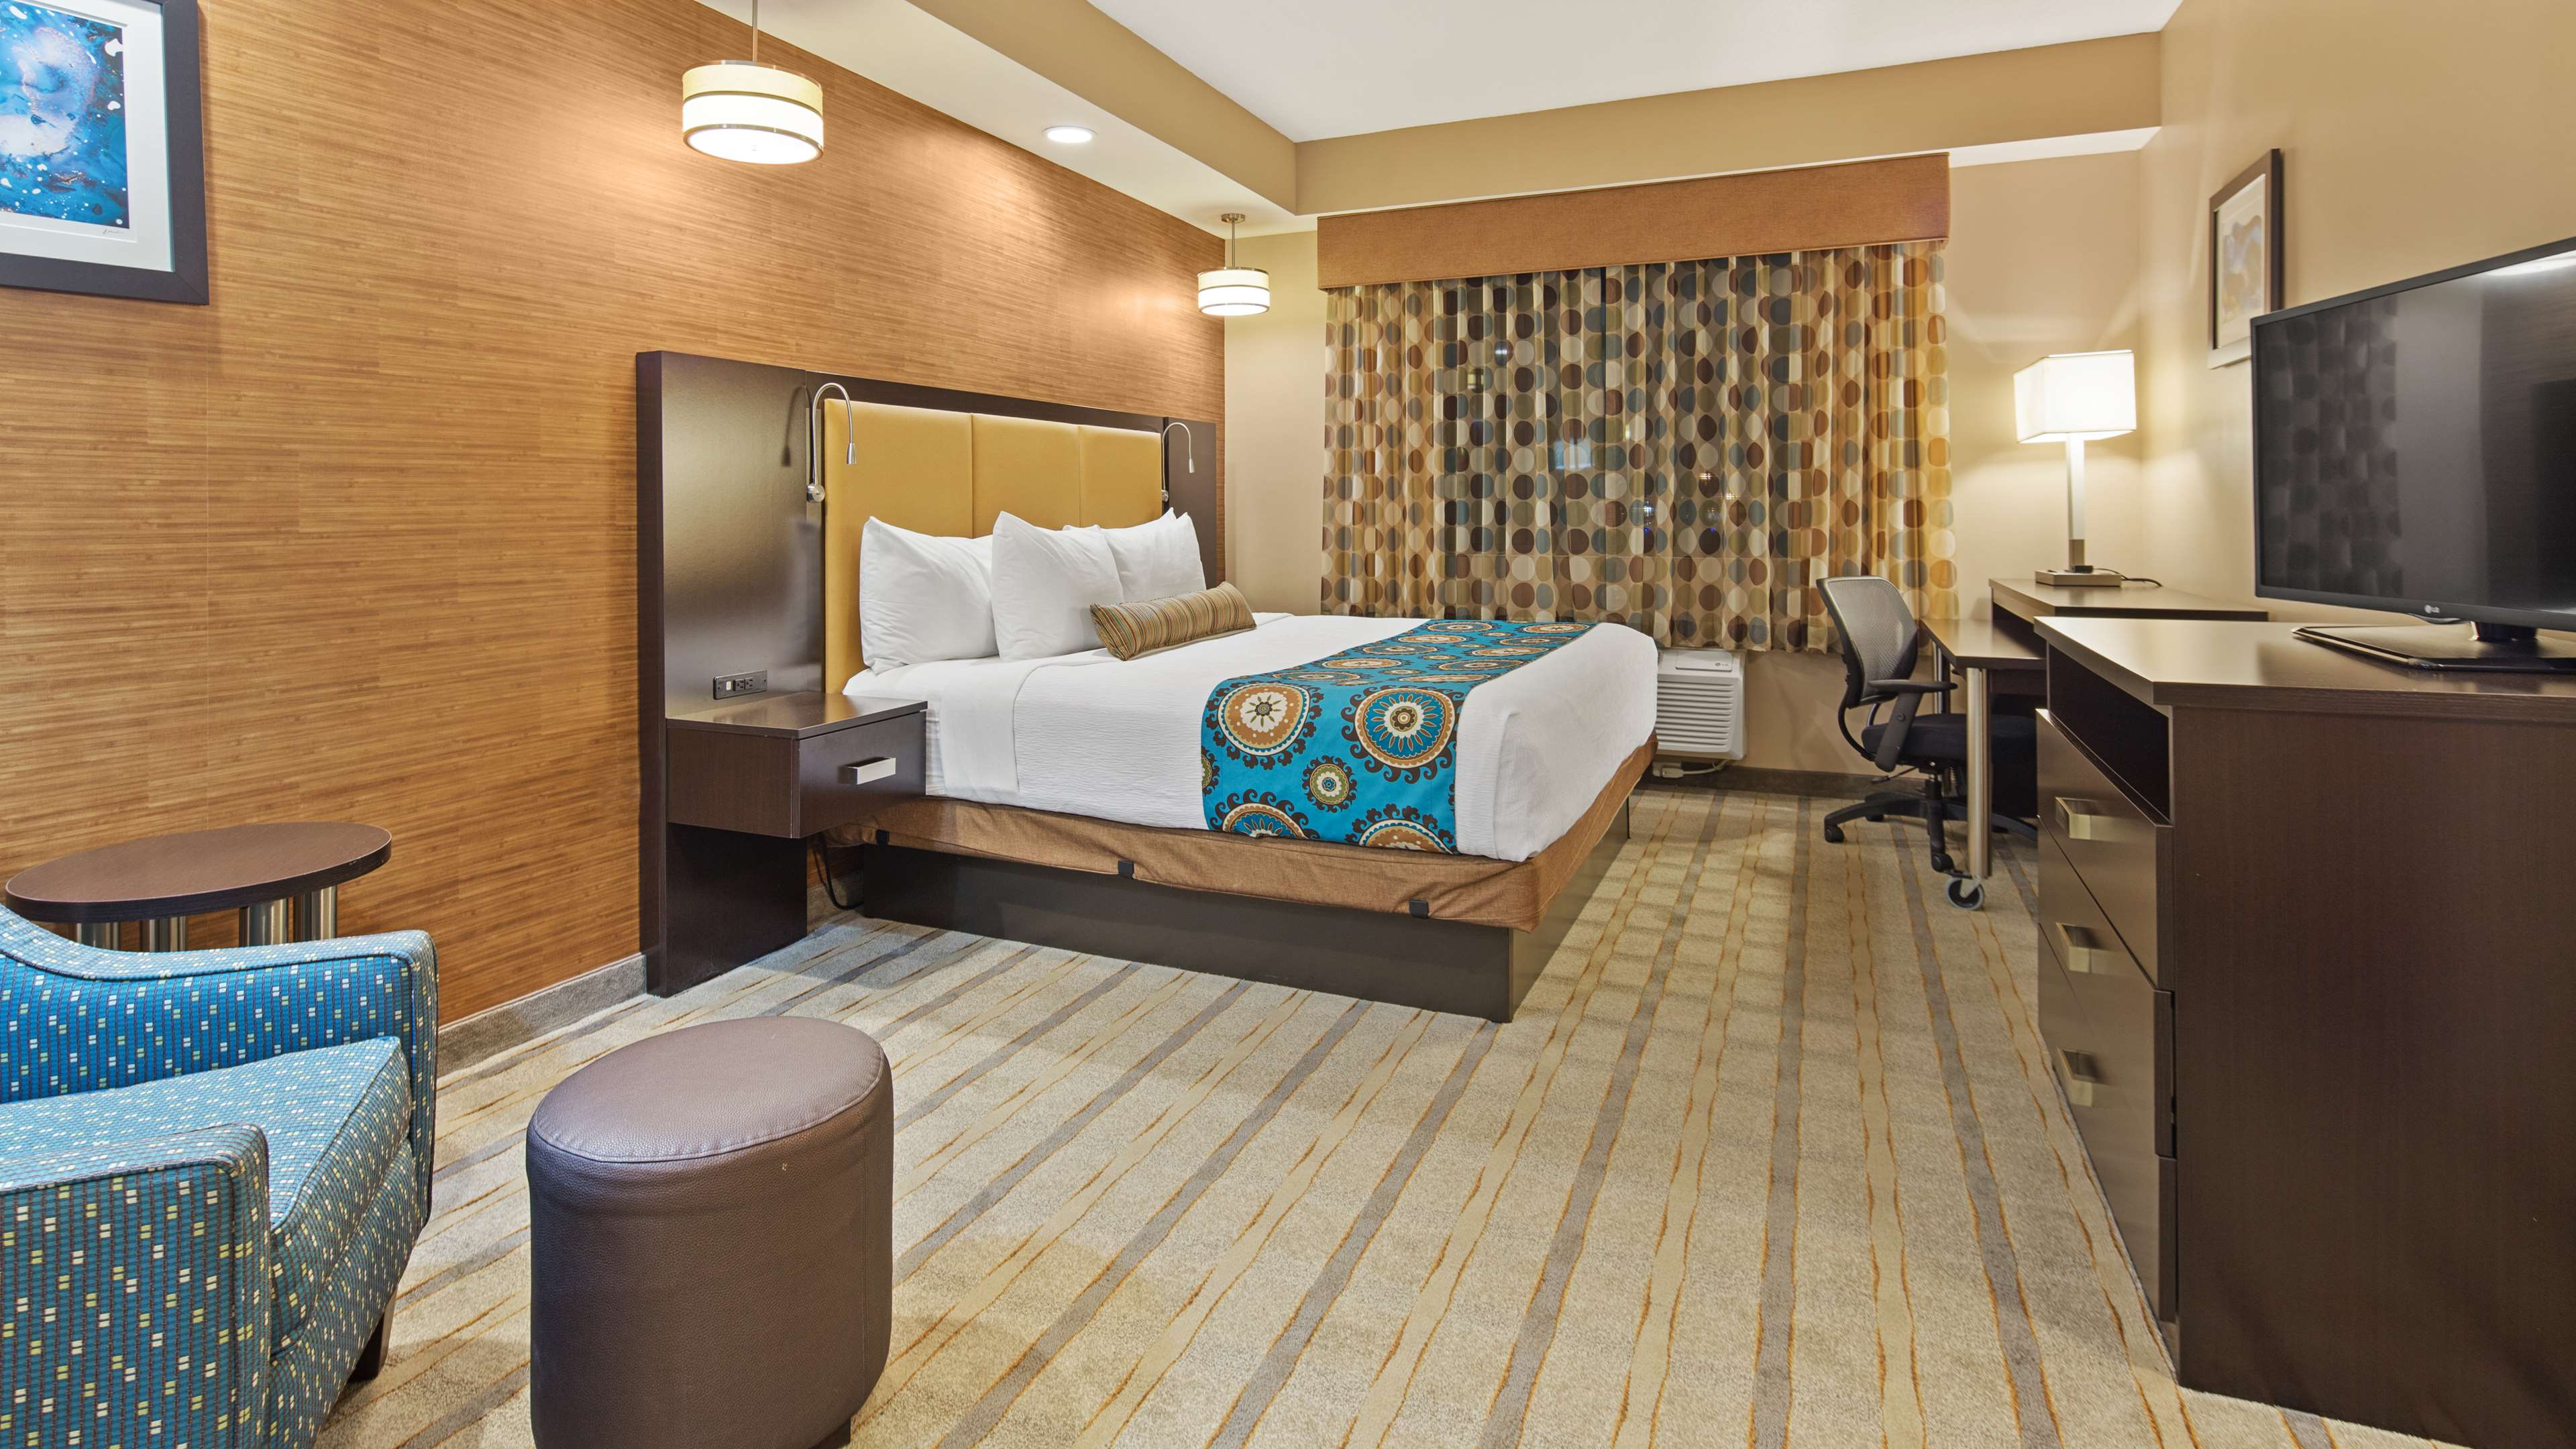 Best Western Plus Kendall Airport Hotel & Suites image 16